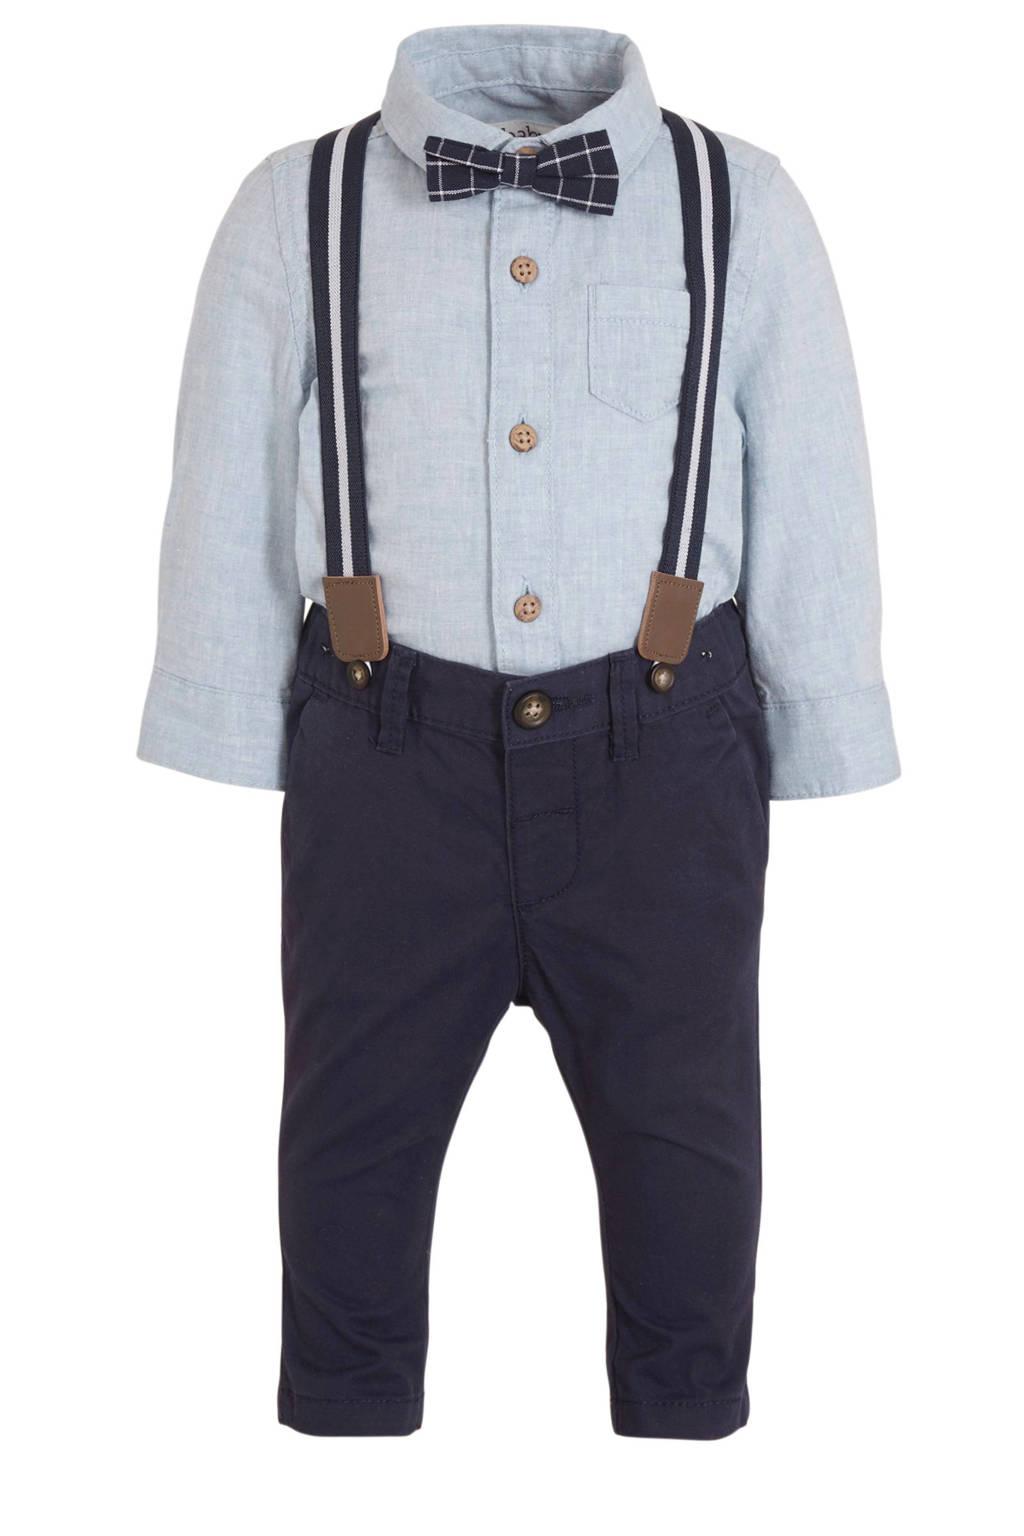 C&A Baby Club overhemd + broek met strik en bretels - set van 4 lichtblauw/donkerblauw, Lichtblauw/donkerblauw